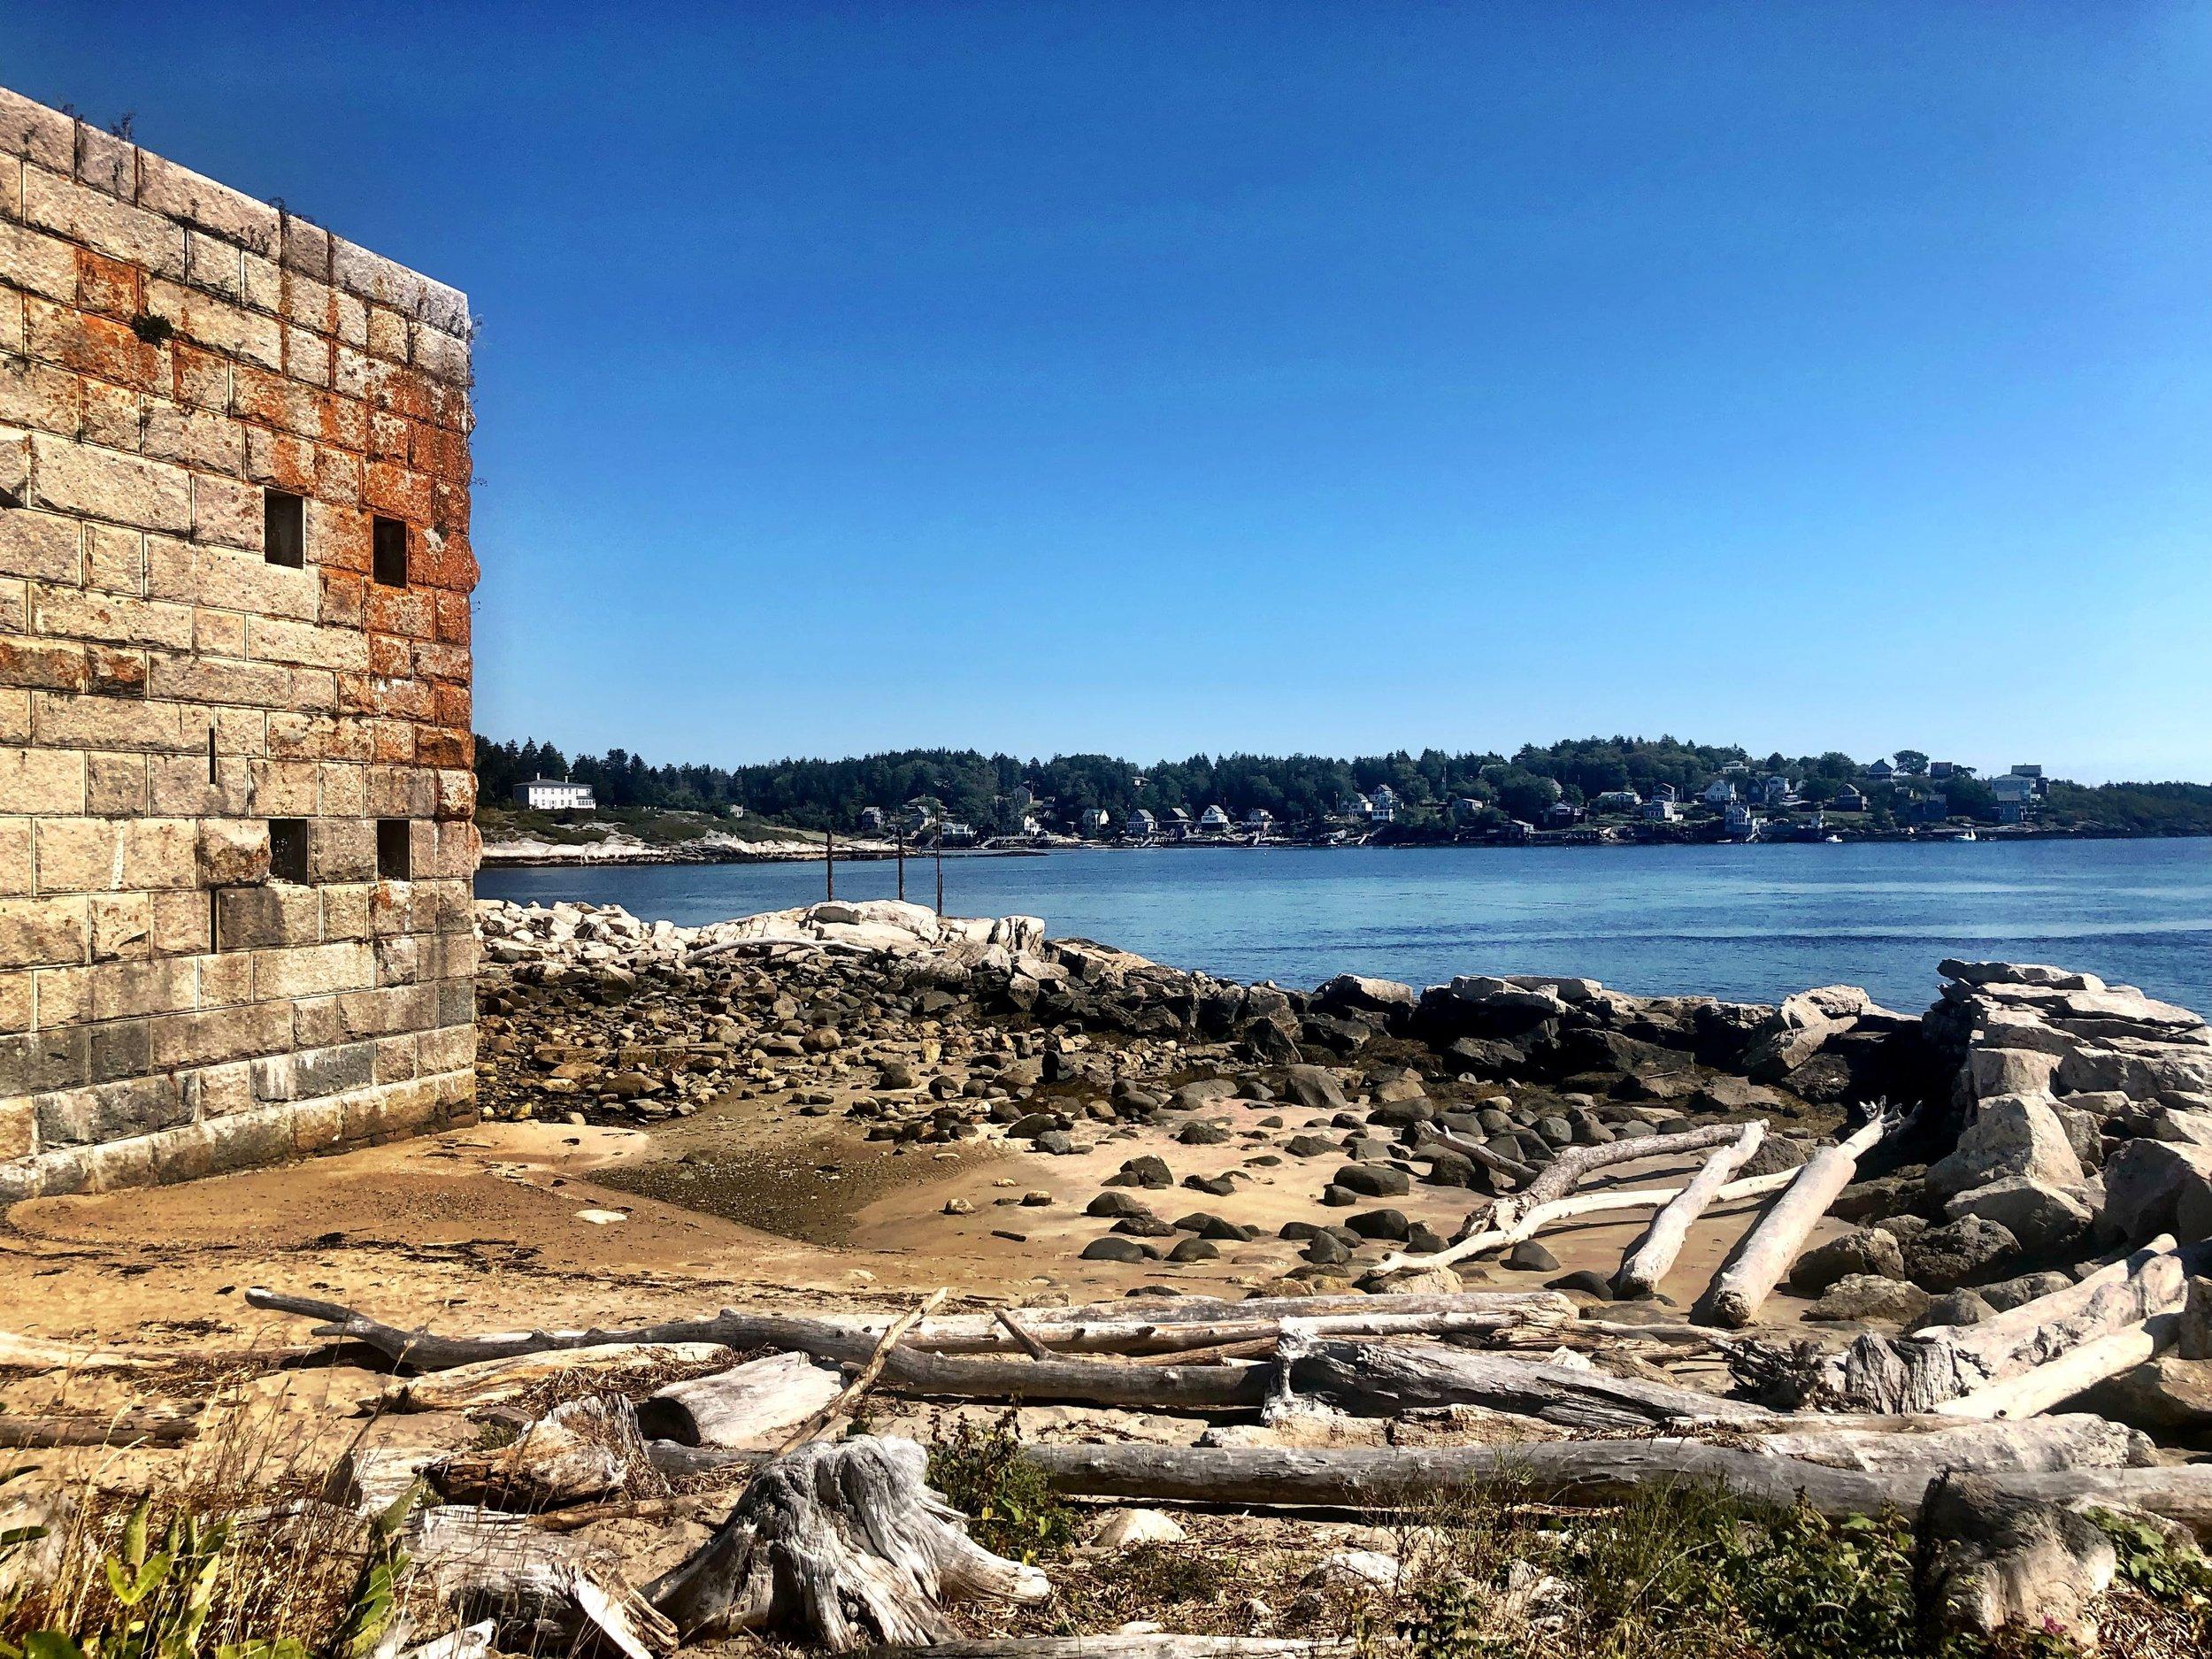 Fort George, Popham Beach, Maine